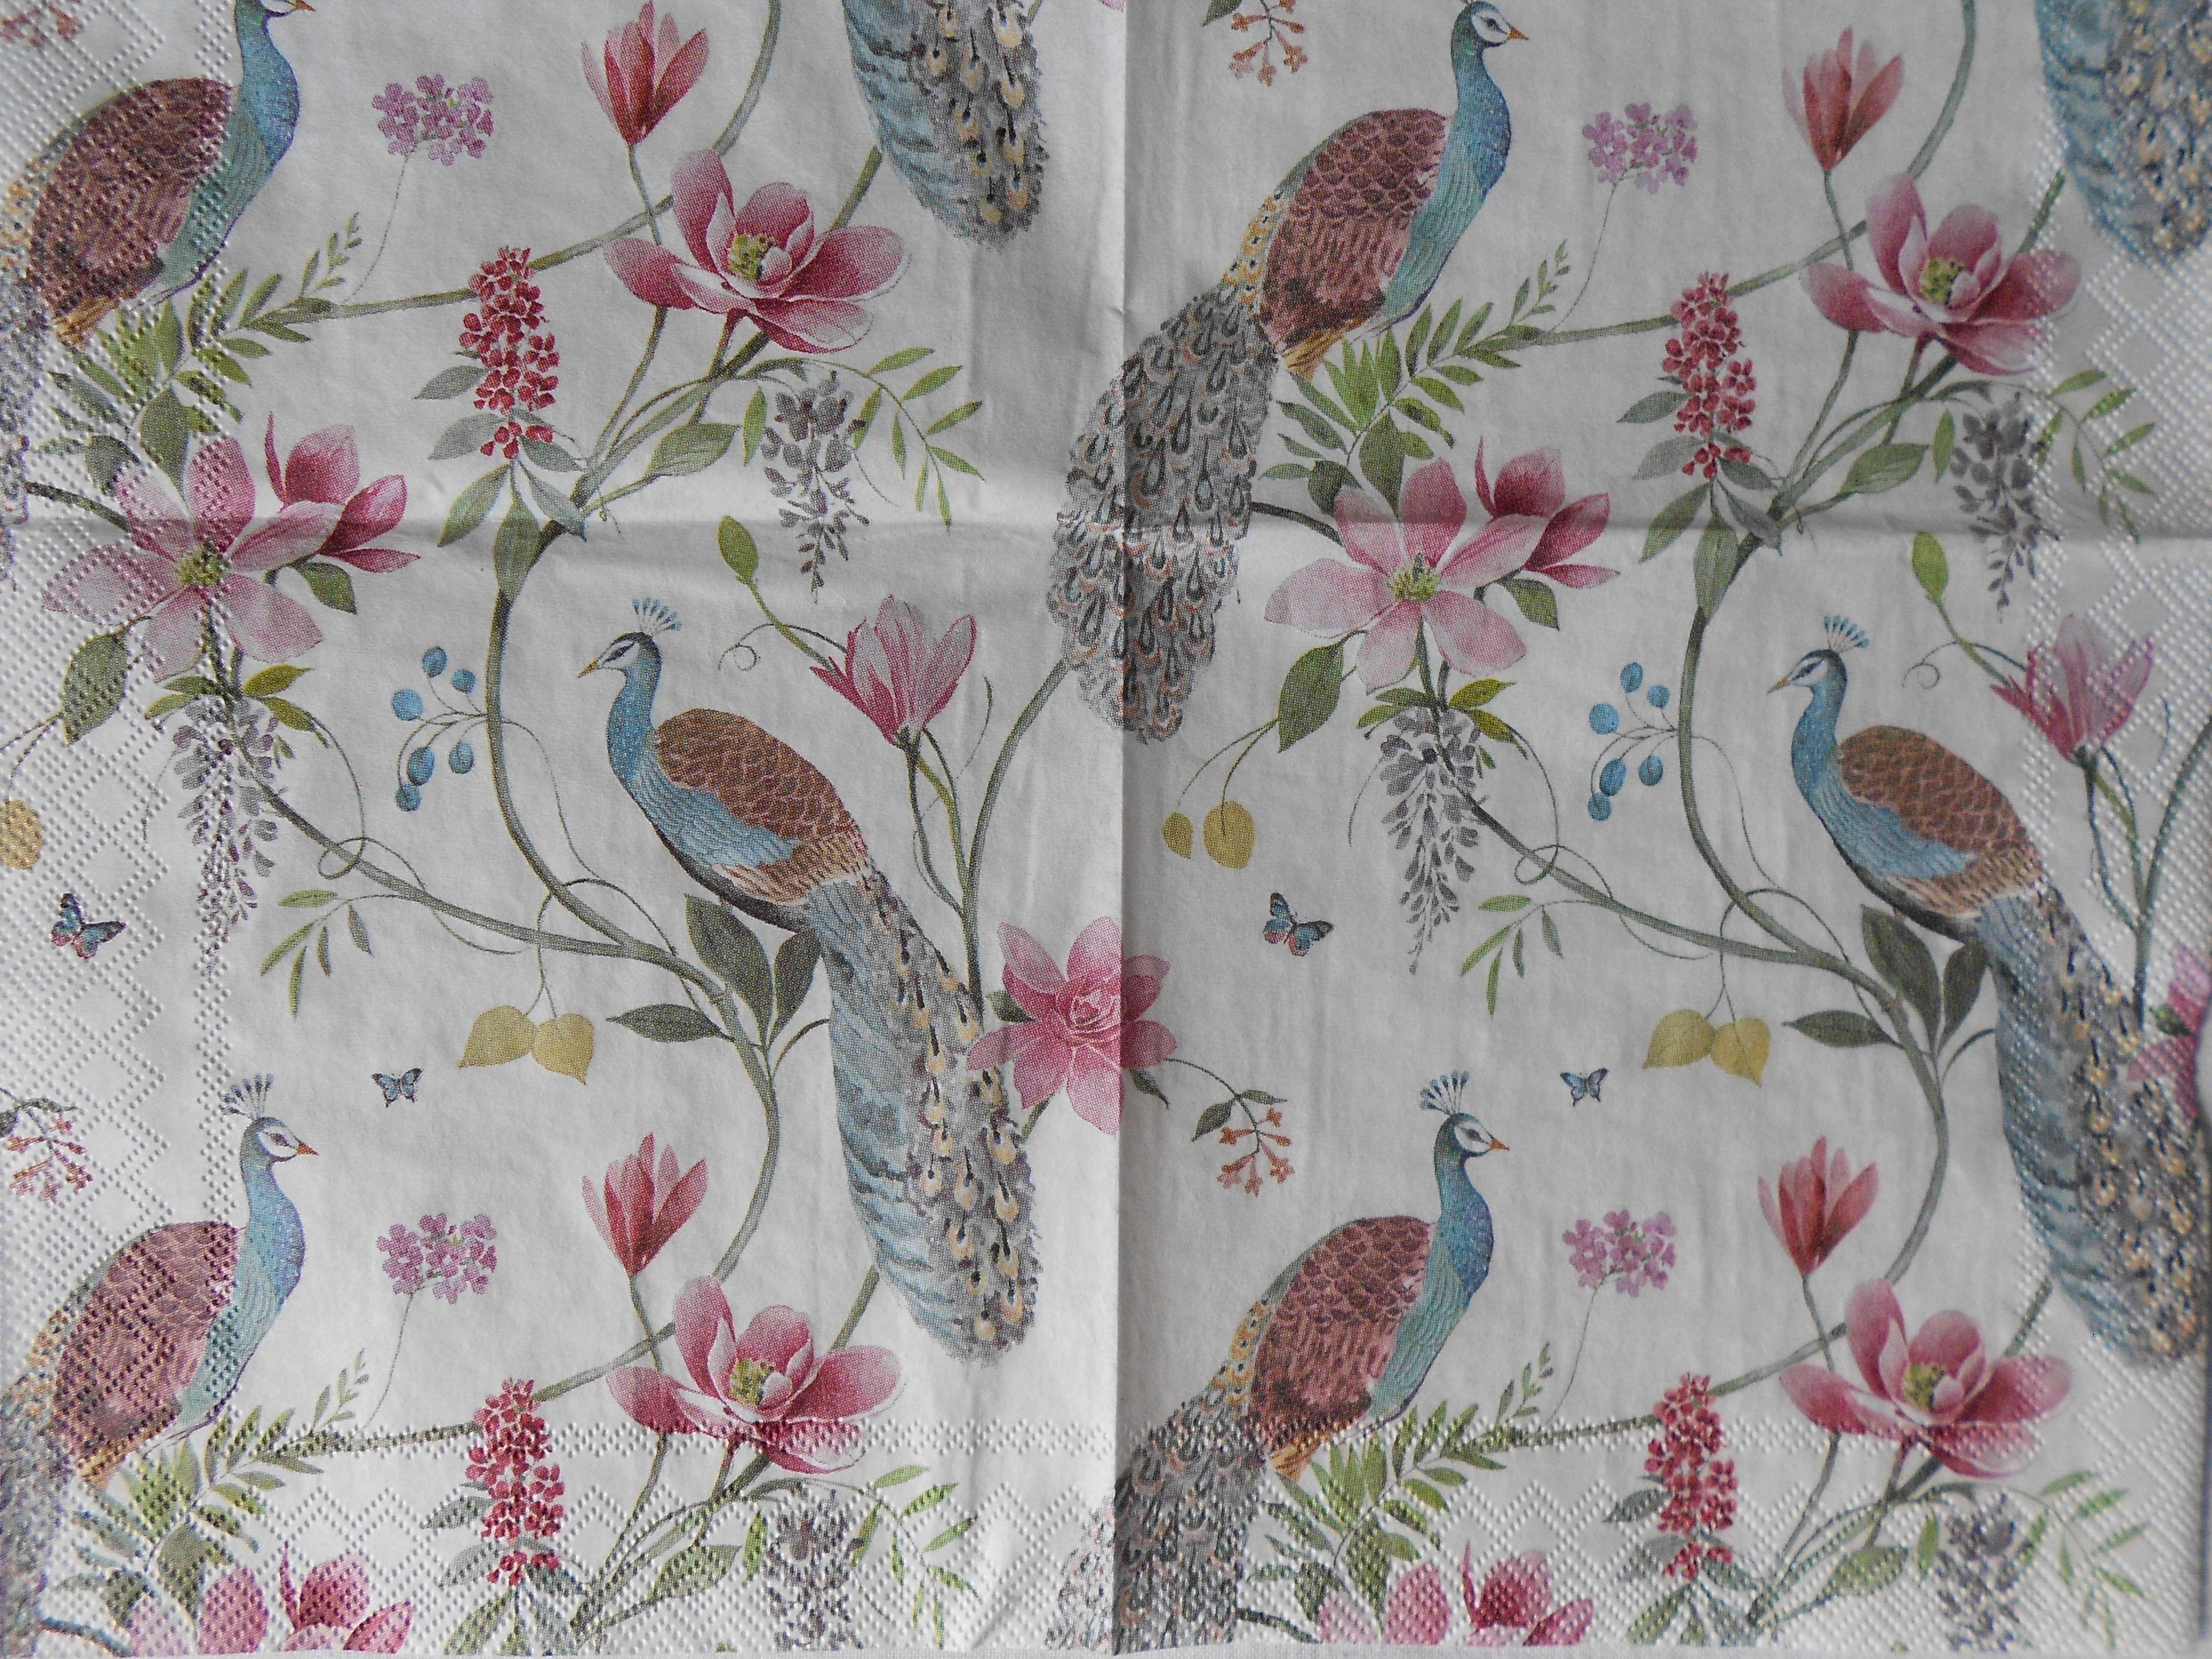 Peacocks Flowers Wallpaper Decoupage Napkins Decoupage Paper